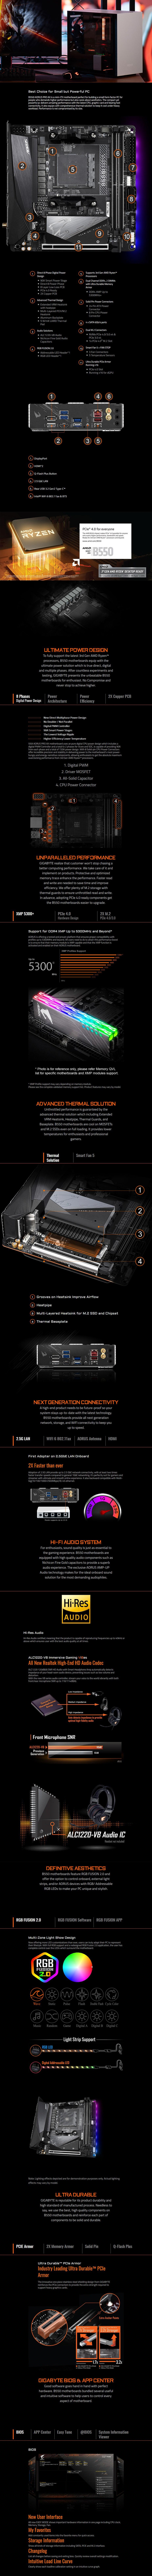 Gigabyte B550I AORUS PRO AX AM4 Mini-ITX Motherboard - Overview 1